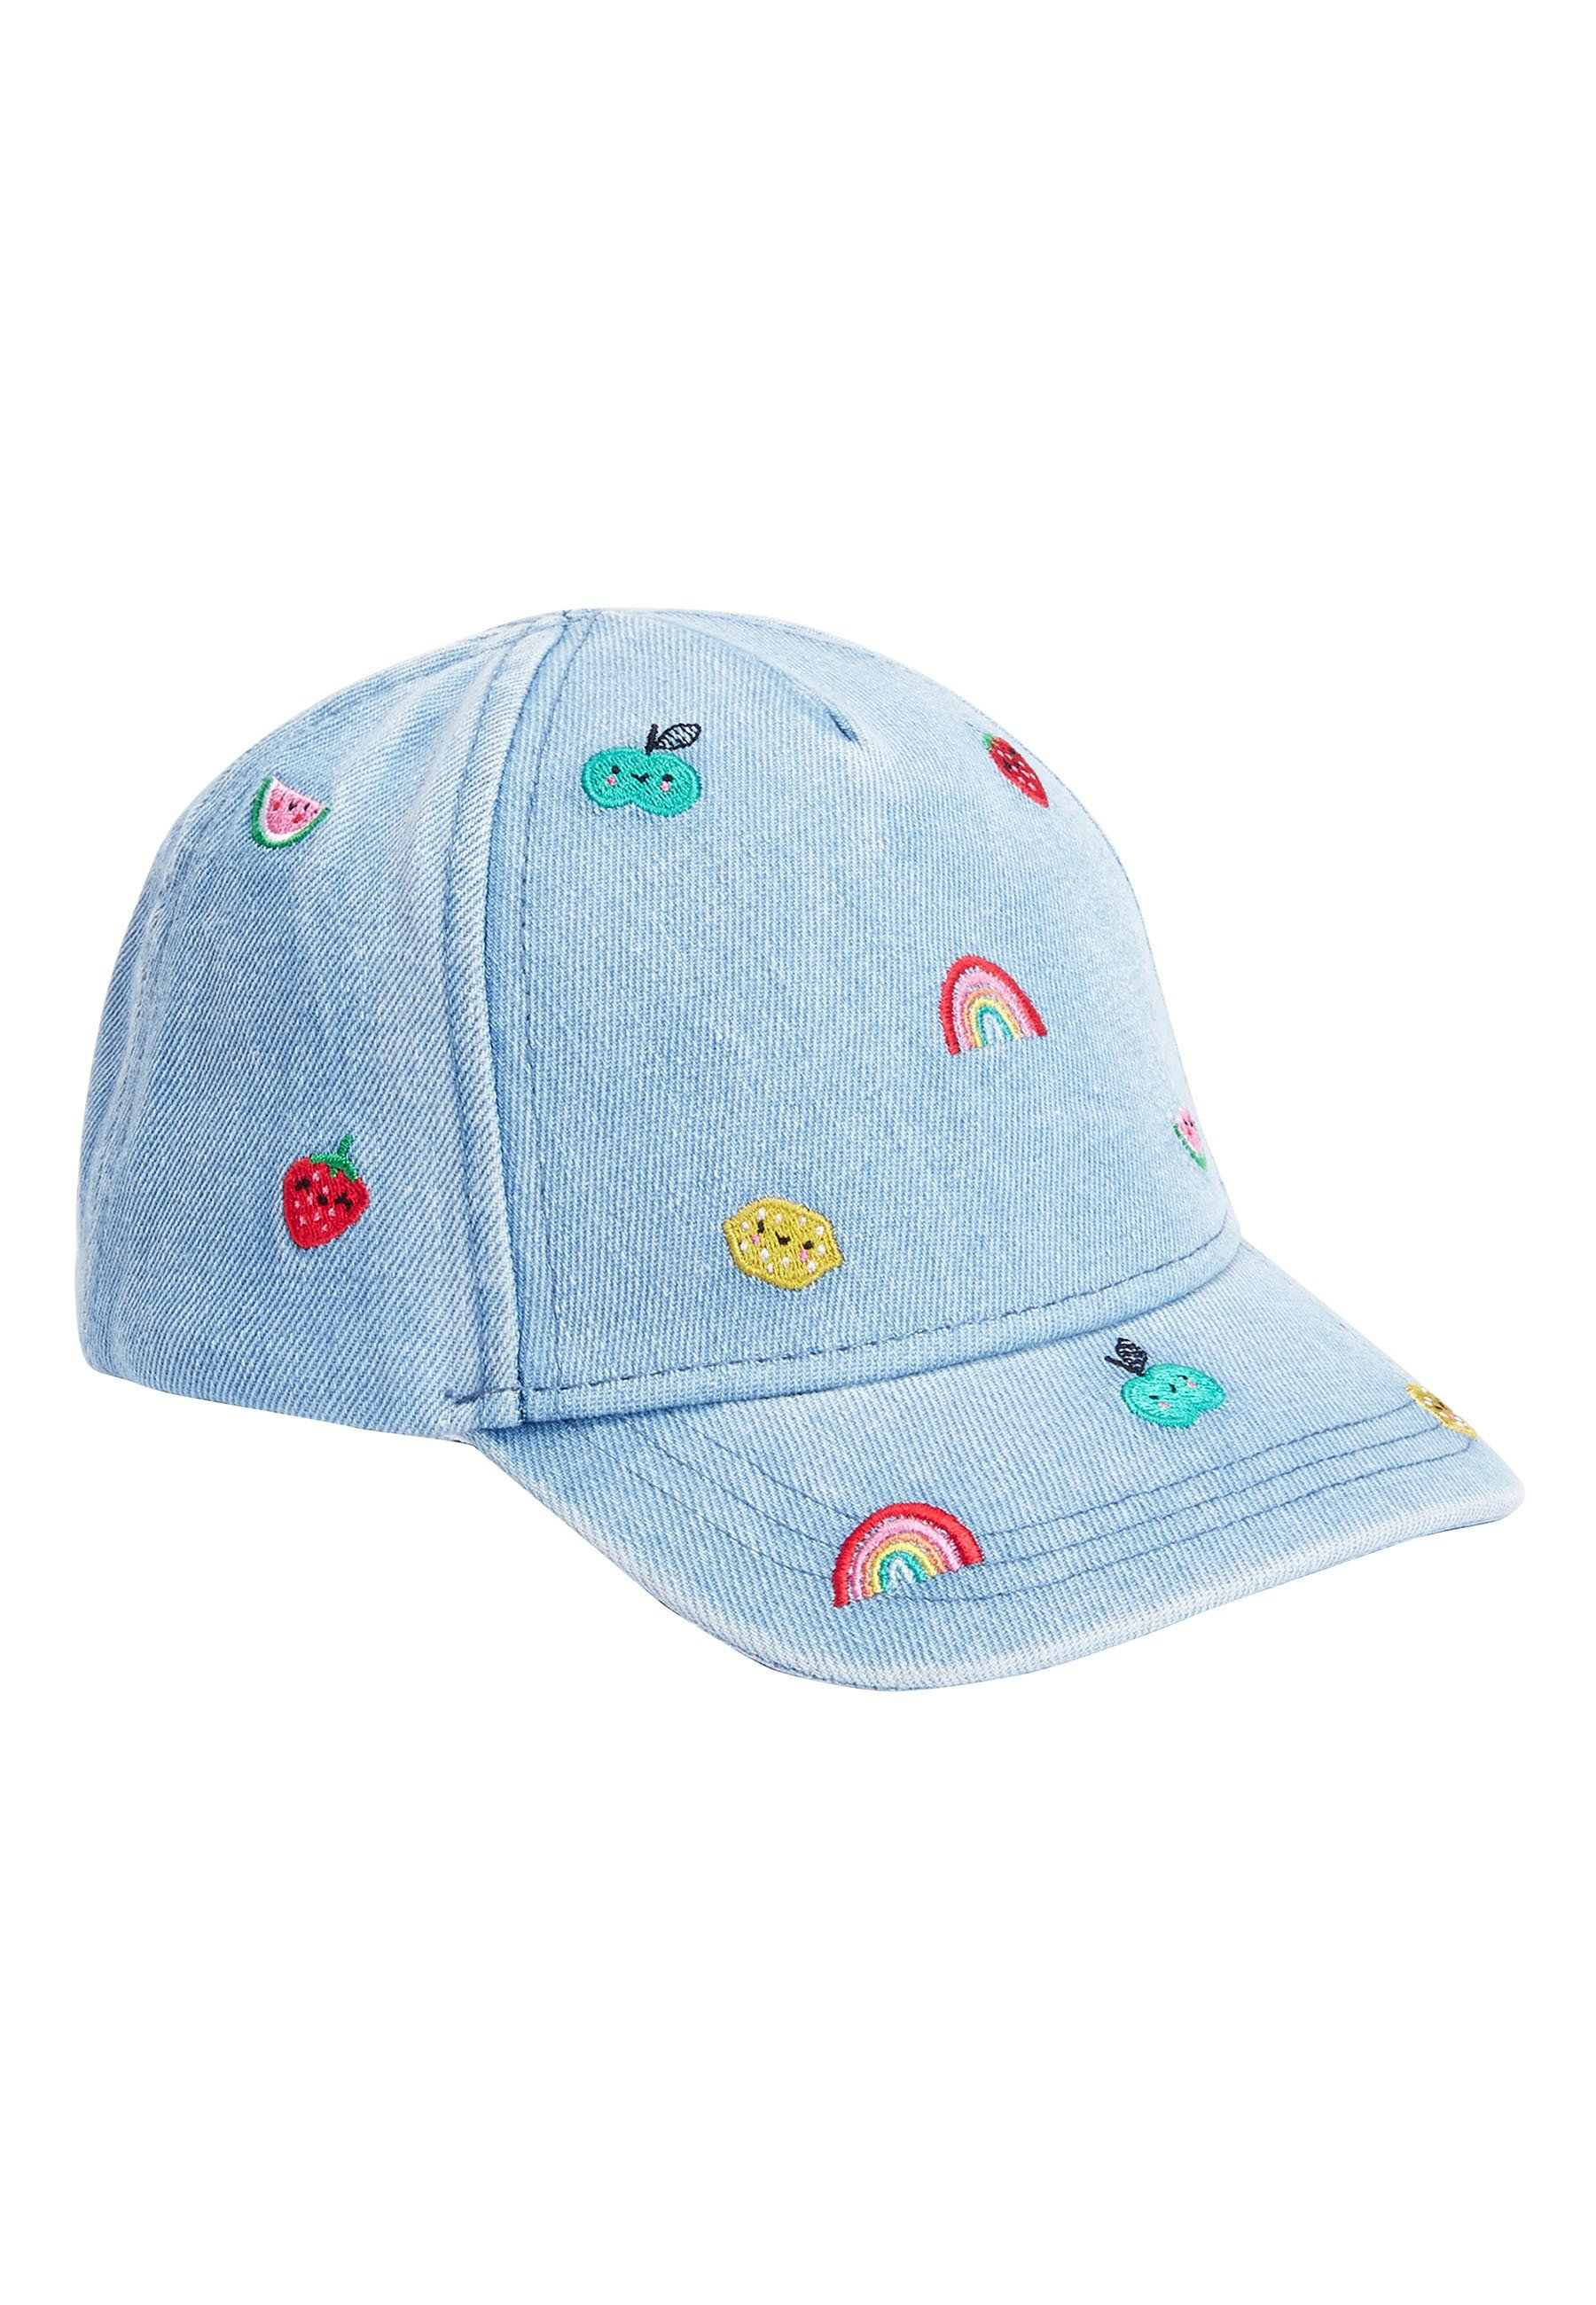 Kinder DENIM EMBROIDERED CAP (YOUNGER) - Cap